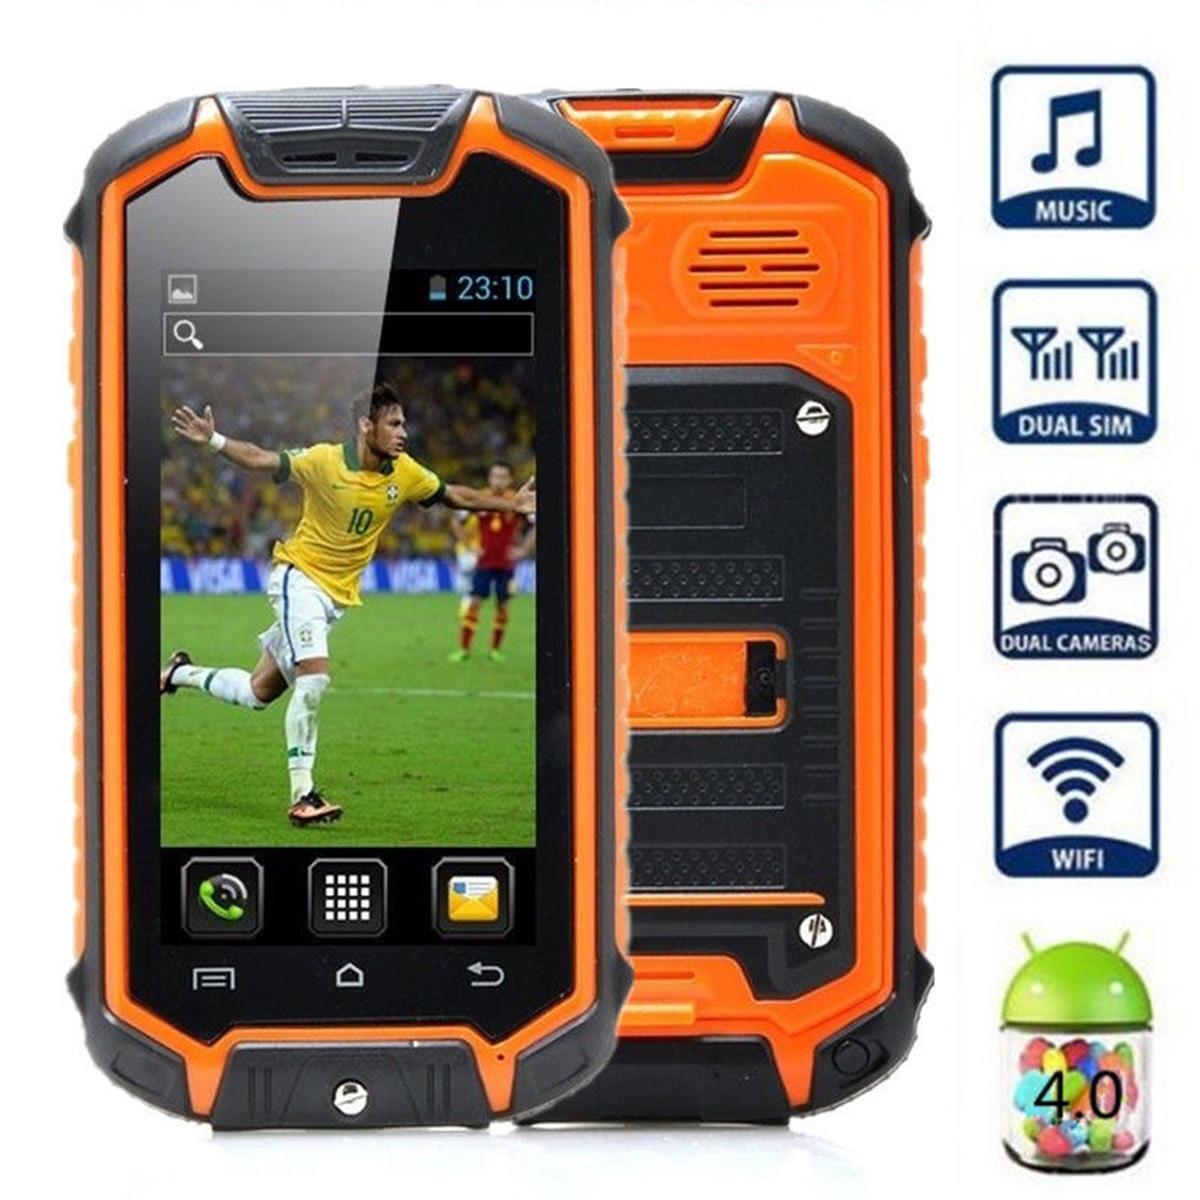 sale retailer 7035b a5944 World's Smallest Waterproof Android 4.0 Smart Mini Z18 Mobile Phone Dual  SIM 2G | eBay